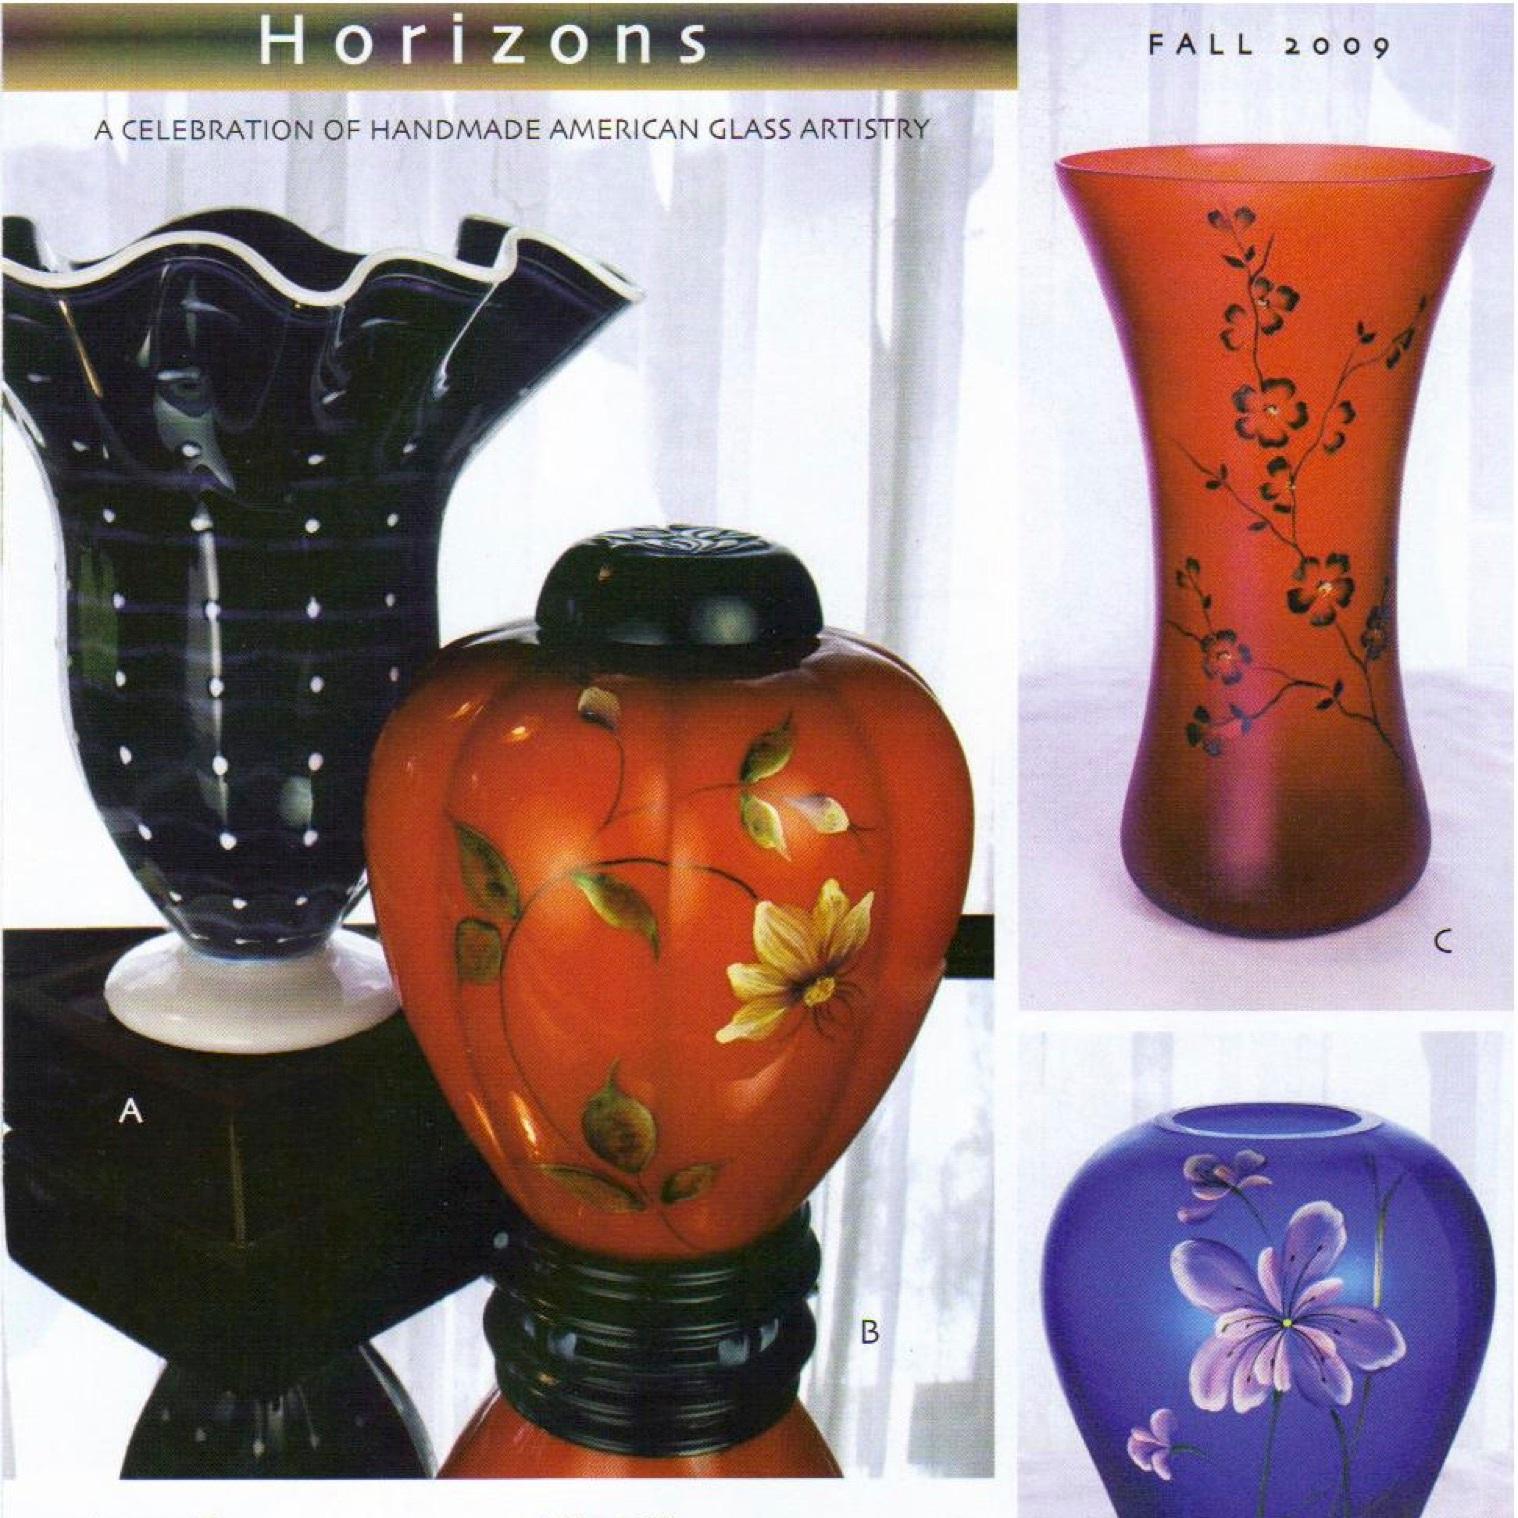 2009 Fall Horizons